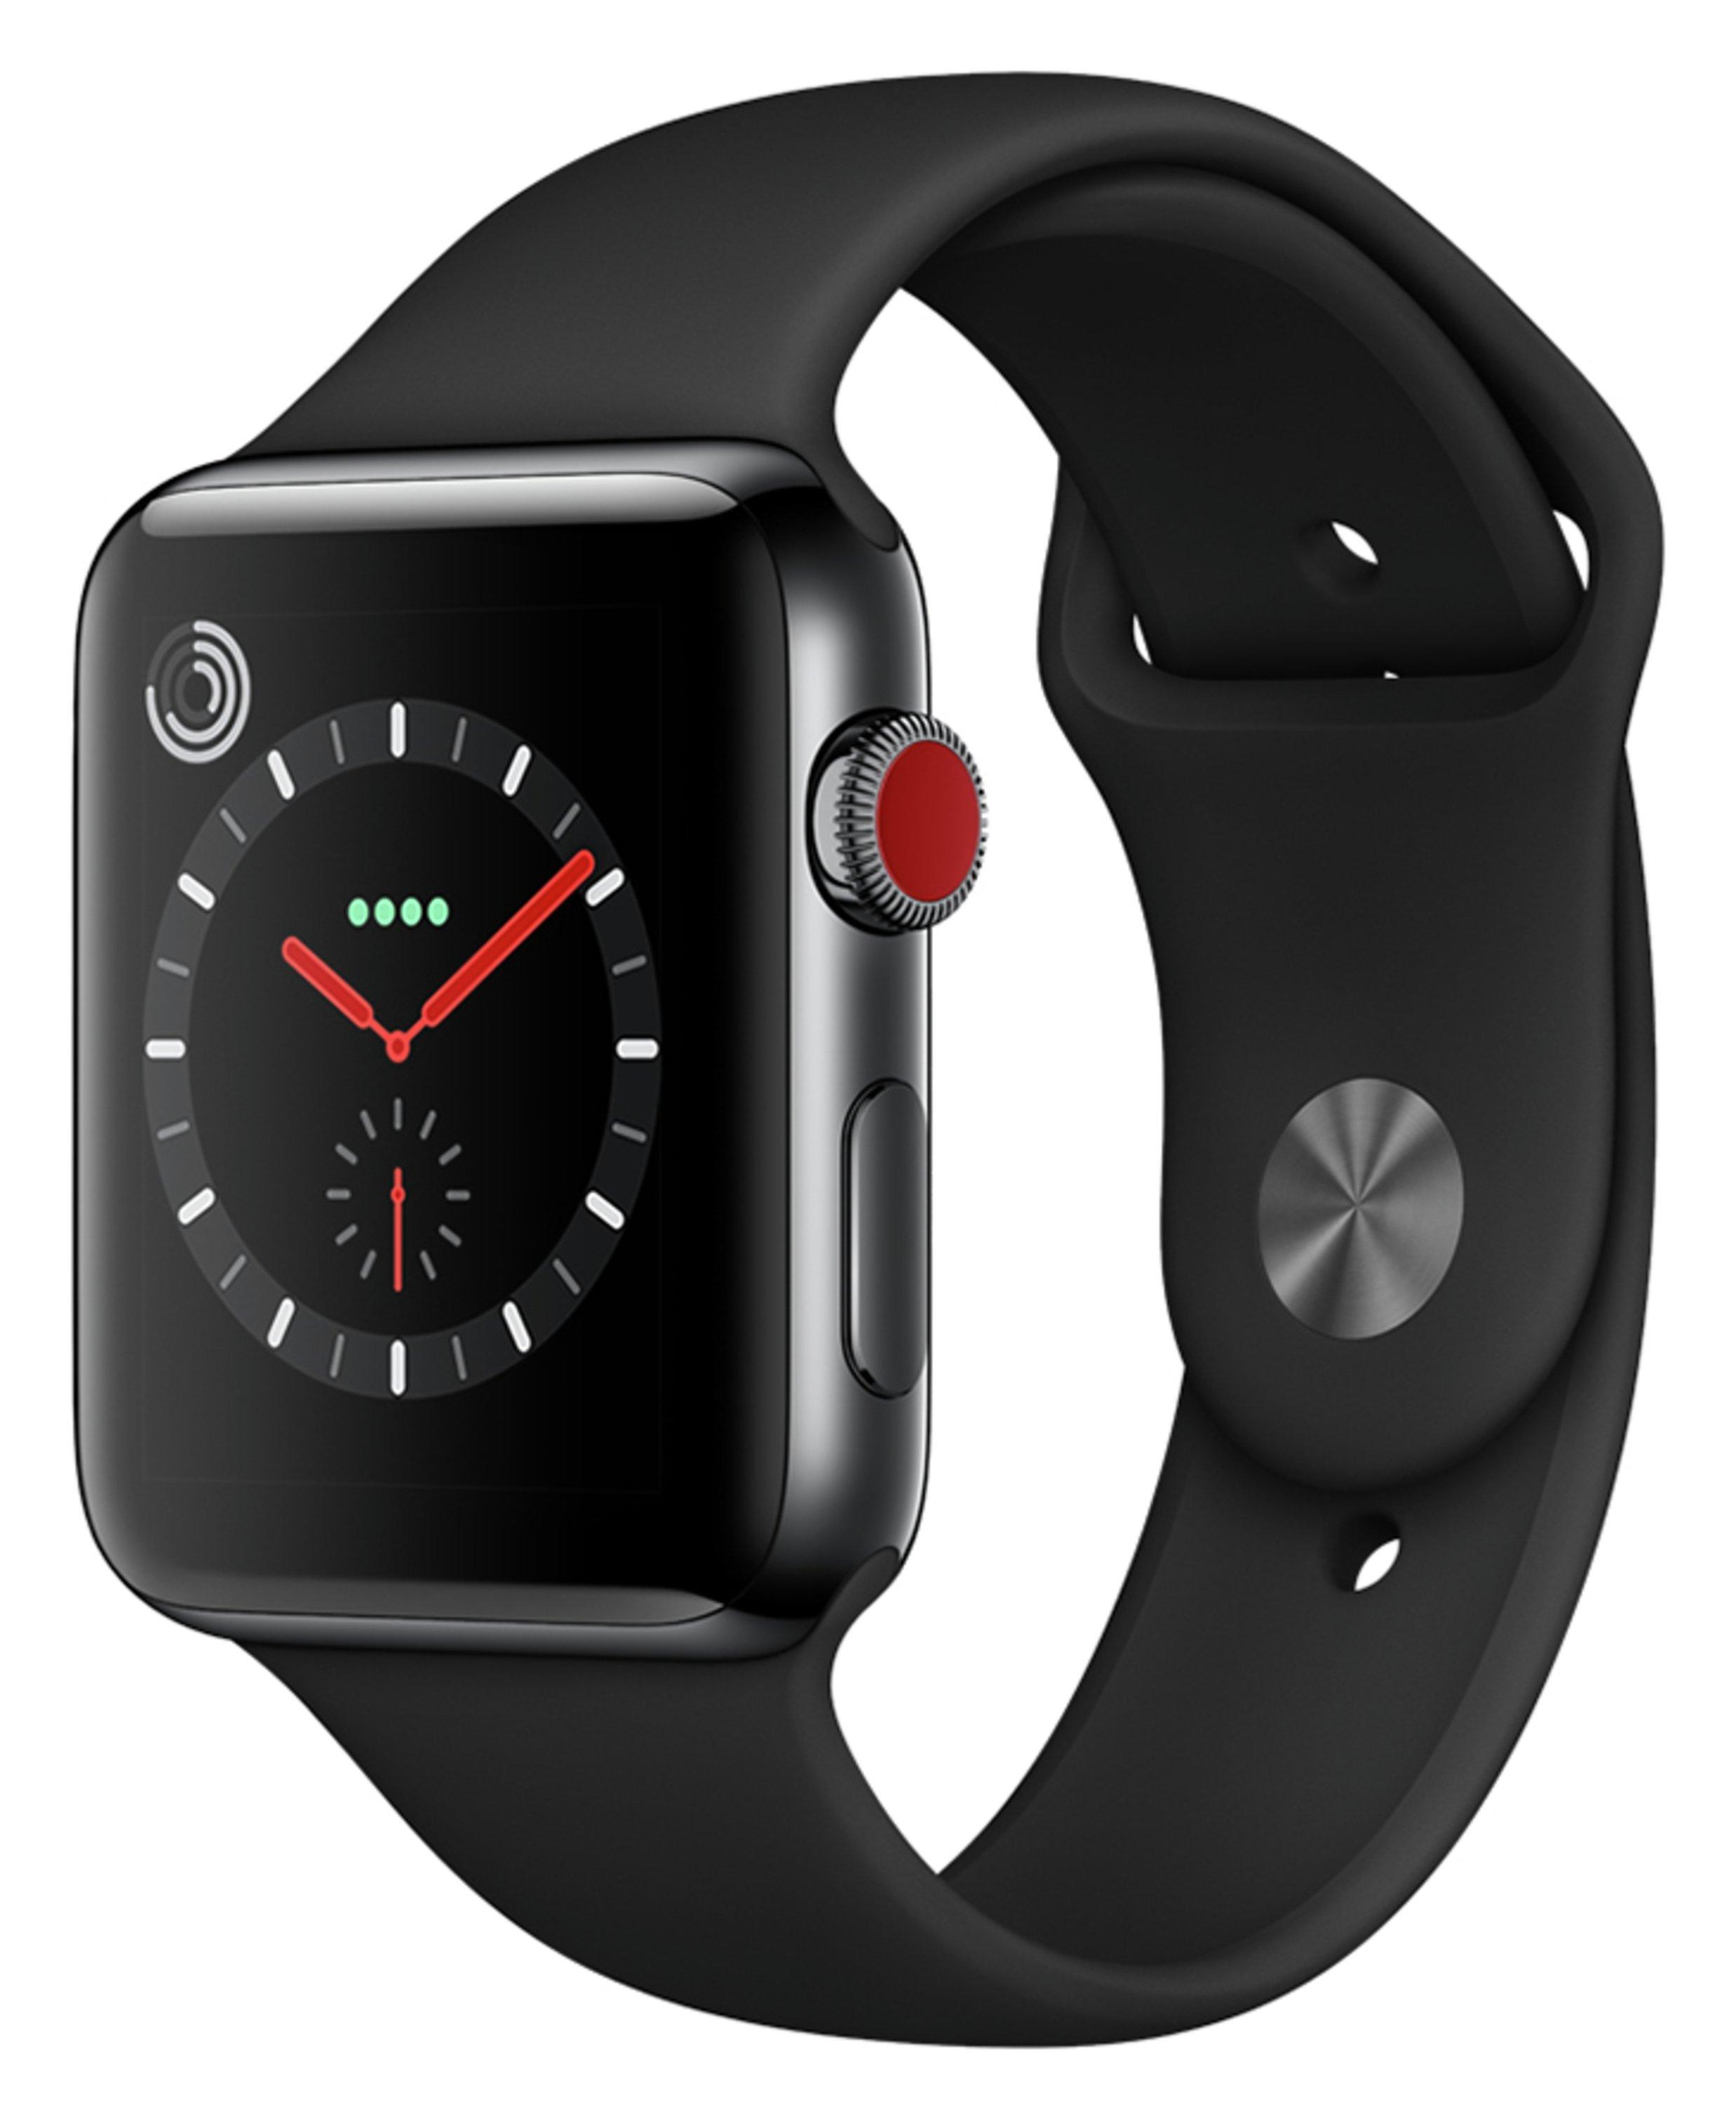 apple-watch-s3-cellular-38mm-black-ss-case-black-band